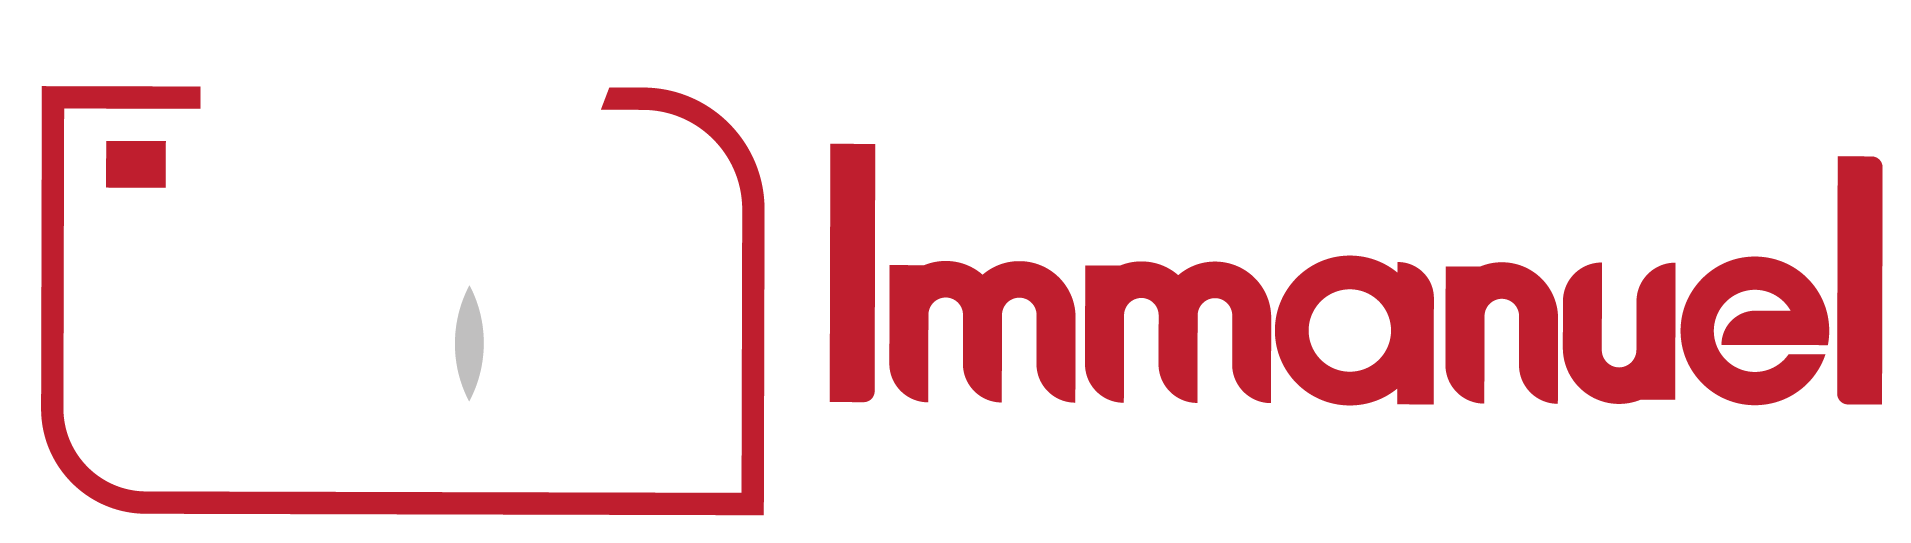 Immanuel Baptist Church Sallisaw